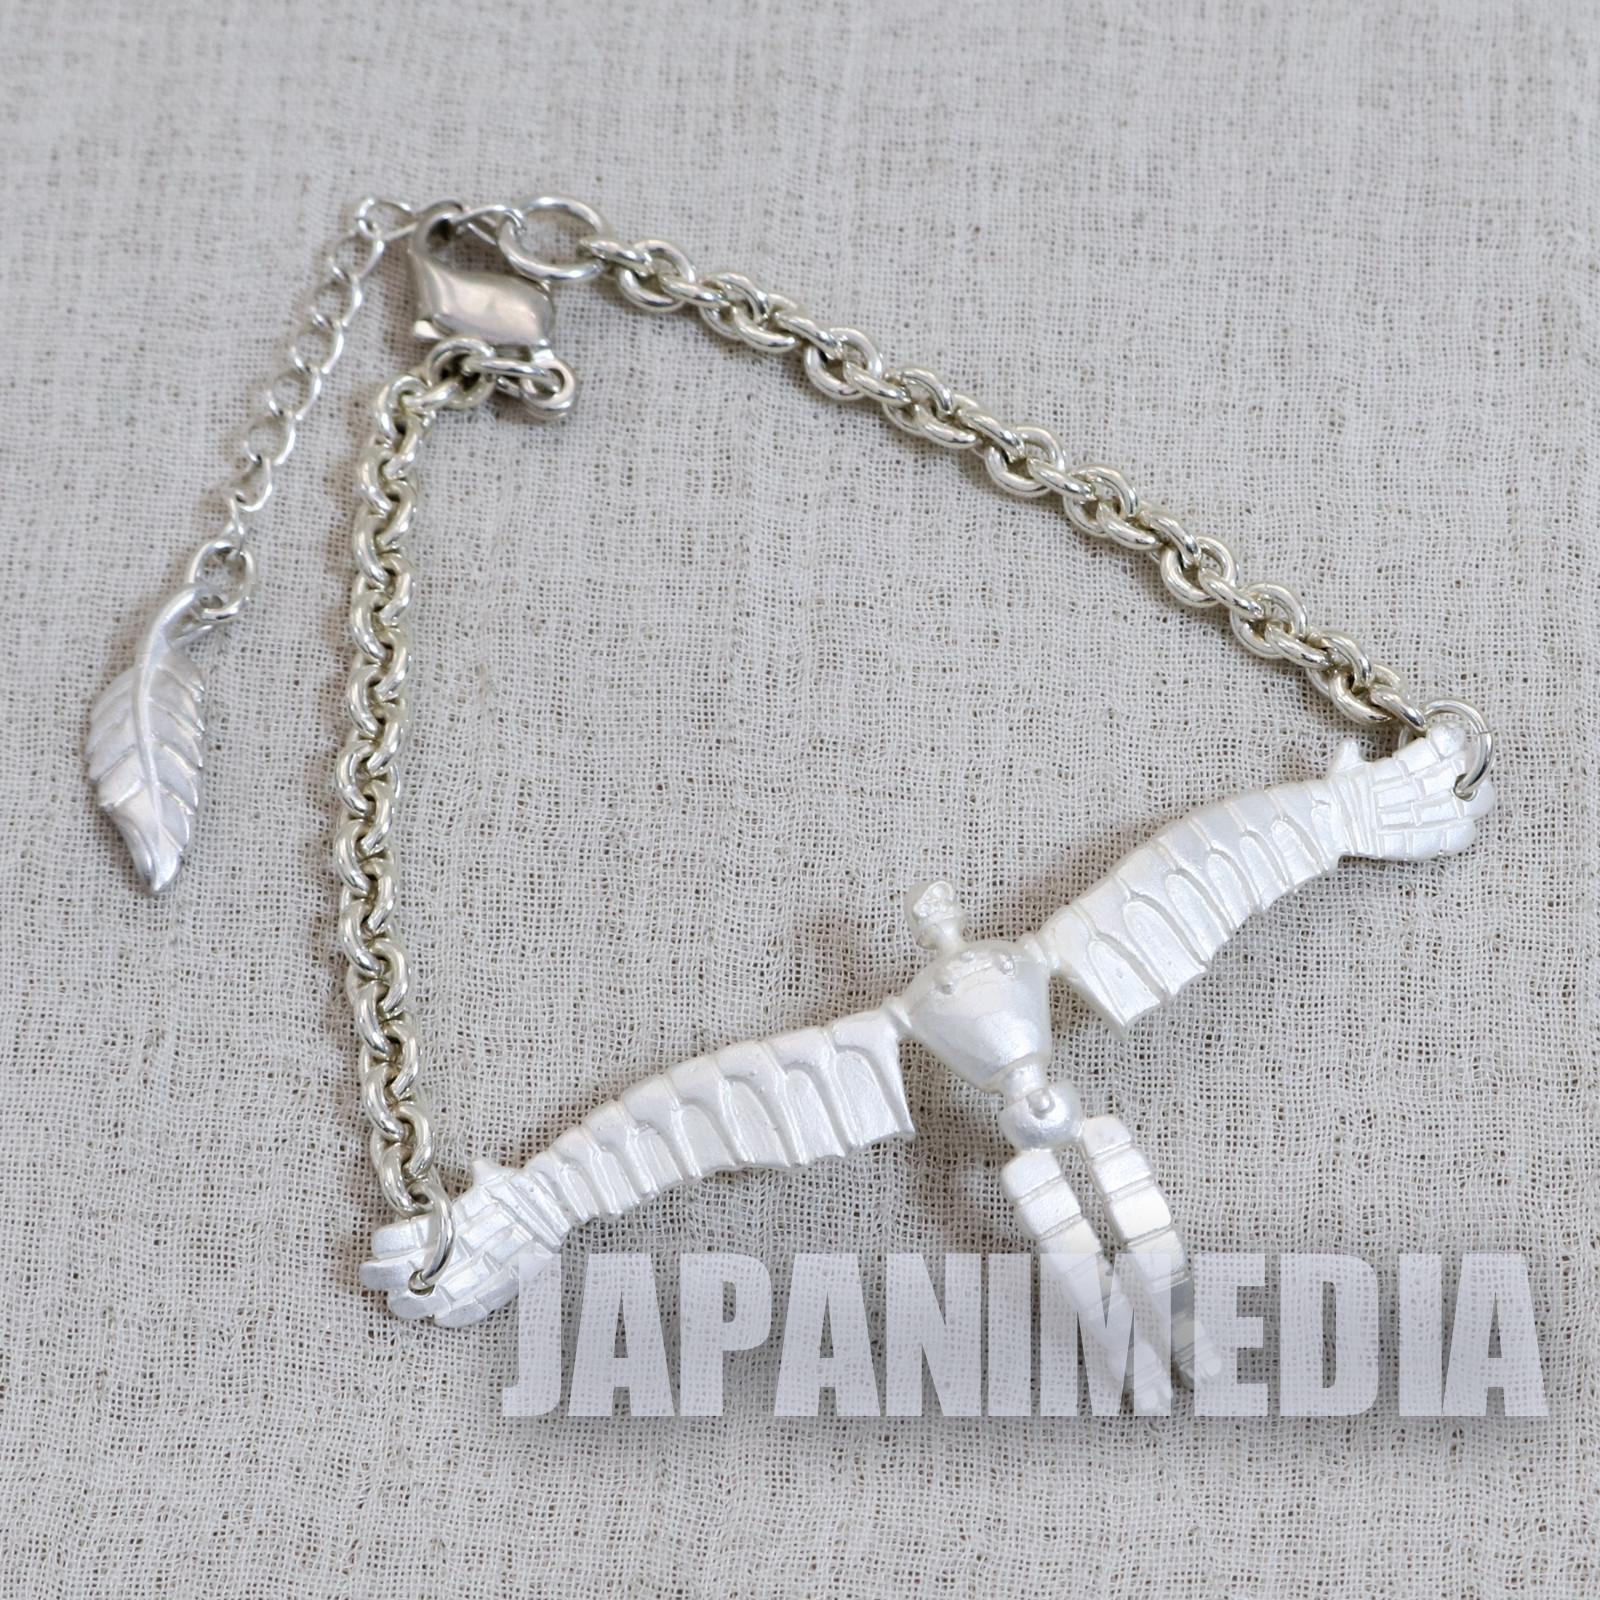 Laputa : Castle in the Sky Robot Soldier White Silver Bracelet JAPAN ANIME